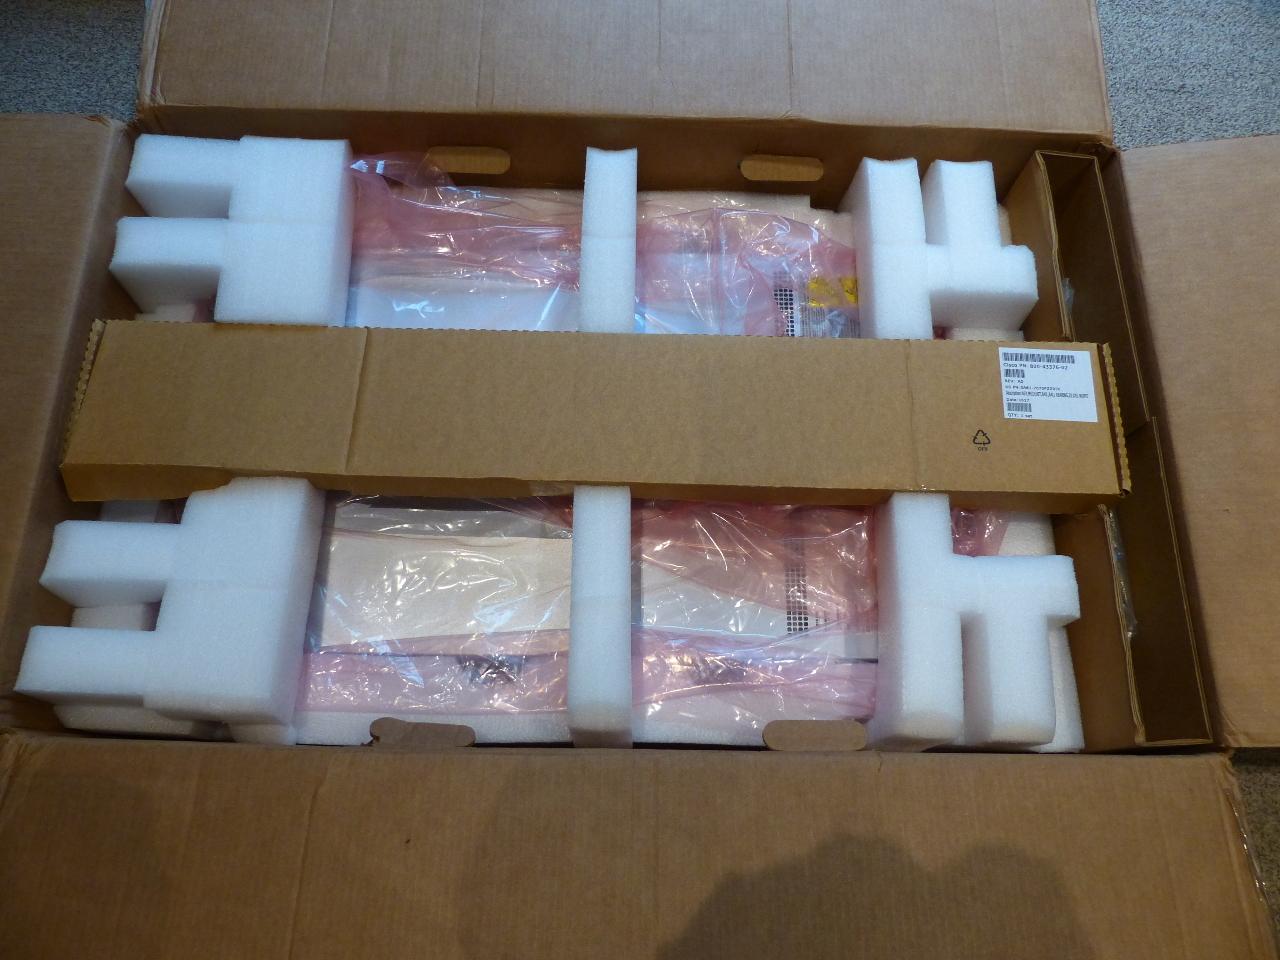 CISCO UCS-C220-M4 SERVER 2* PSU 6* COOLER FANS 6* 300GB SAS 2* 16GB PC4  BE6M-M4-K9